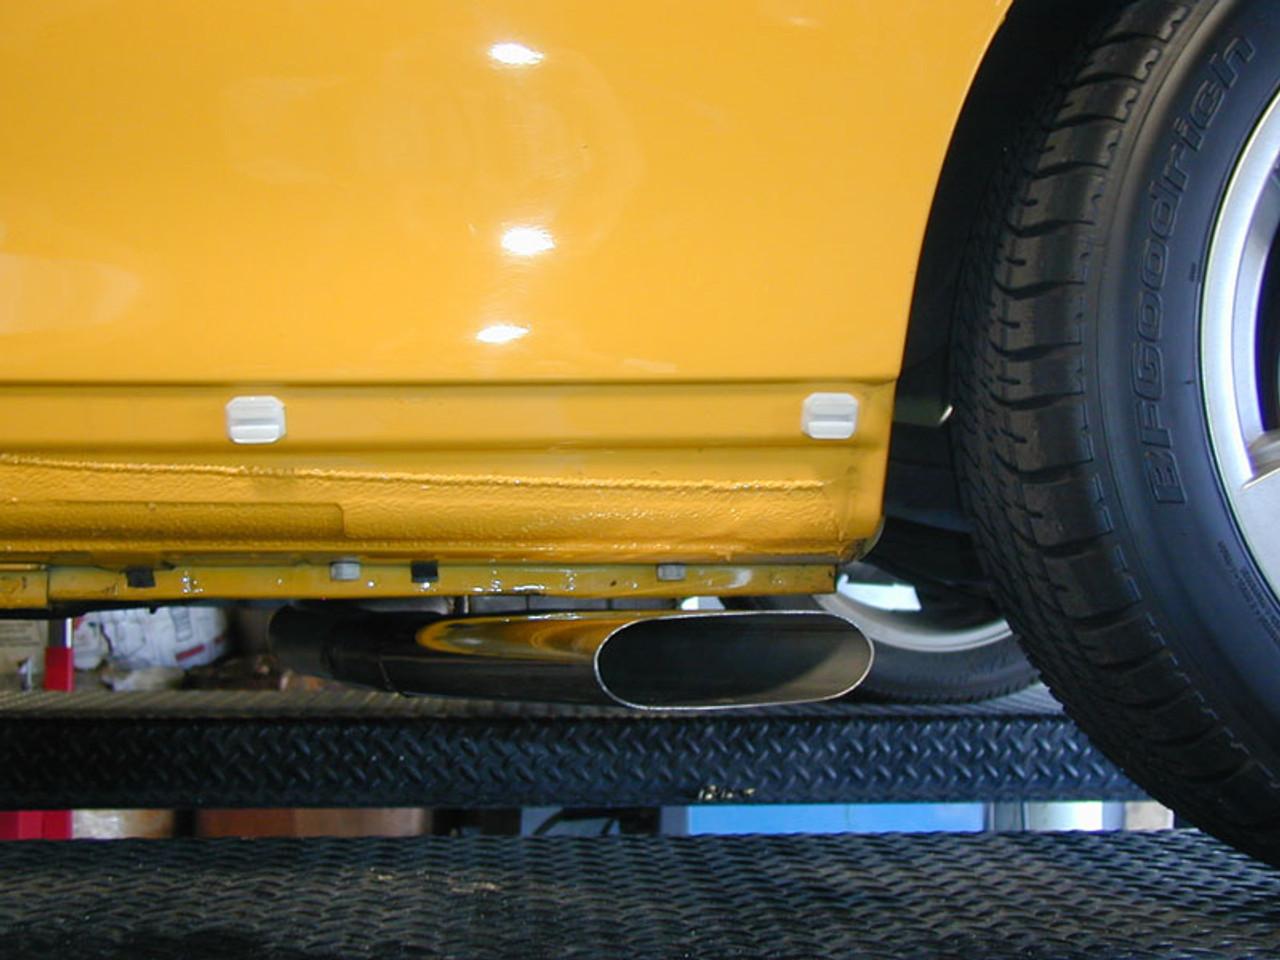 pontiac gto 2004 2005 side exhaust system